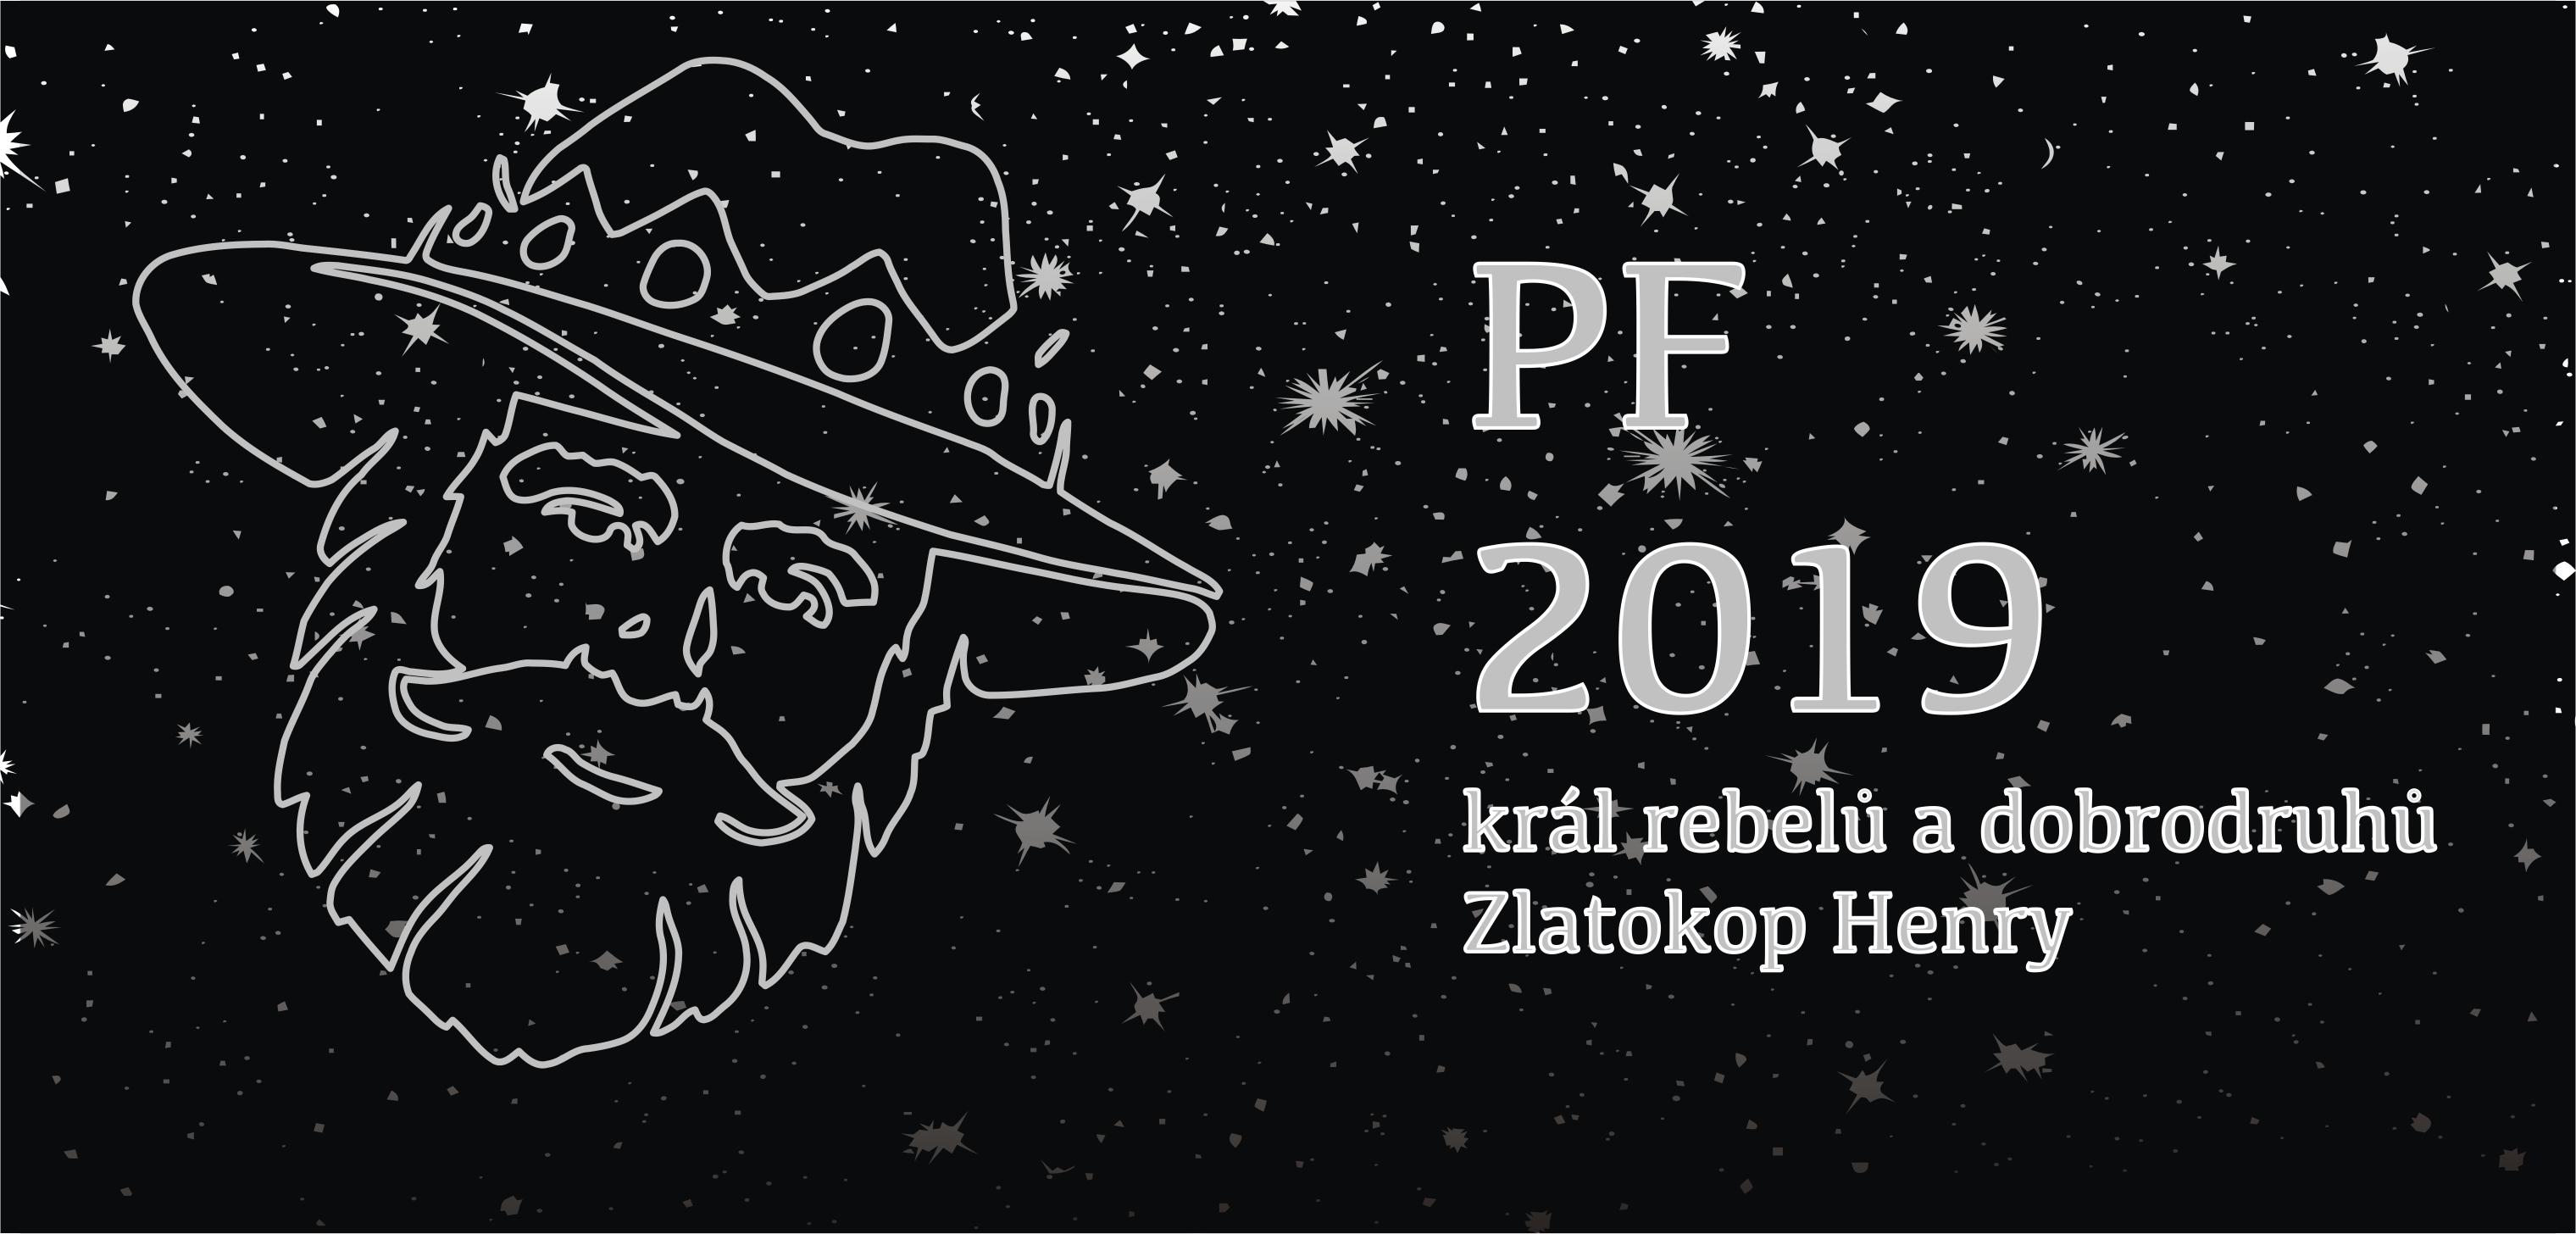 Jiří Broš / PF 2019 Zlatokop Henry